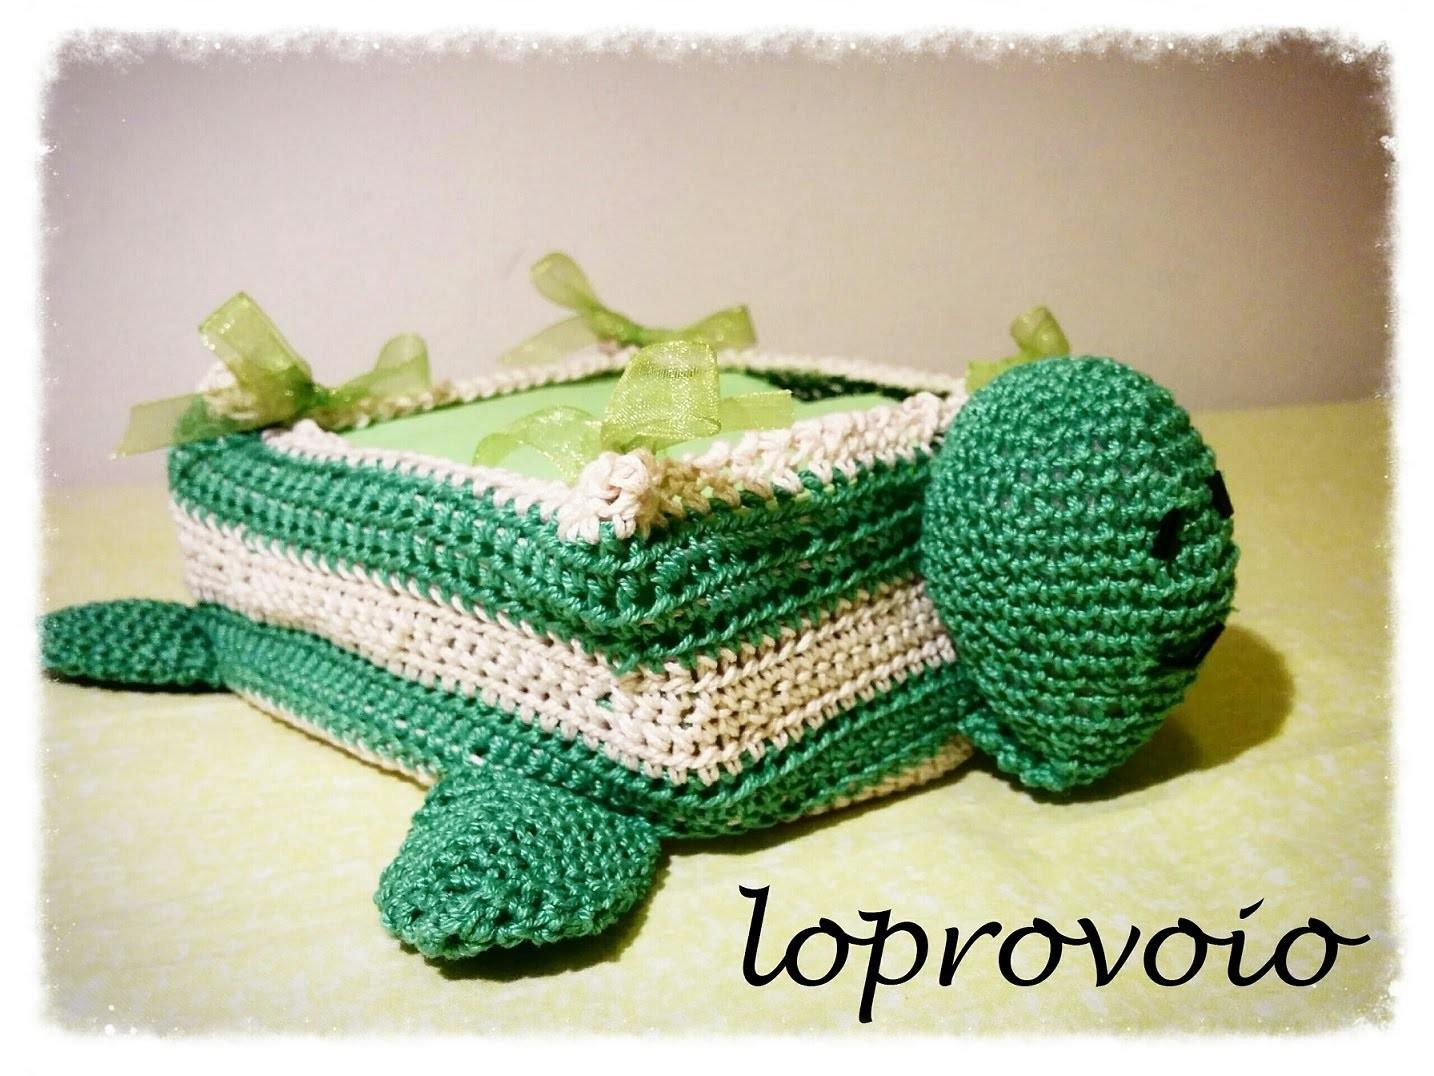 Tartaruga porta tovaglioli - Crochet Turtle Napkin Holder